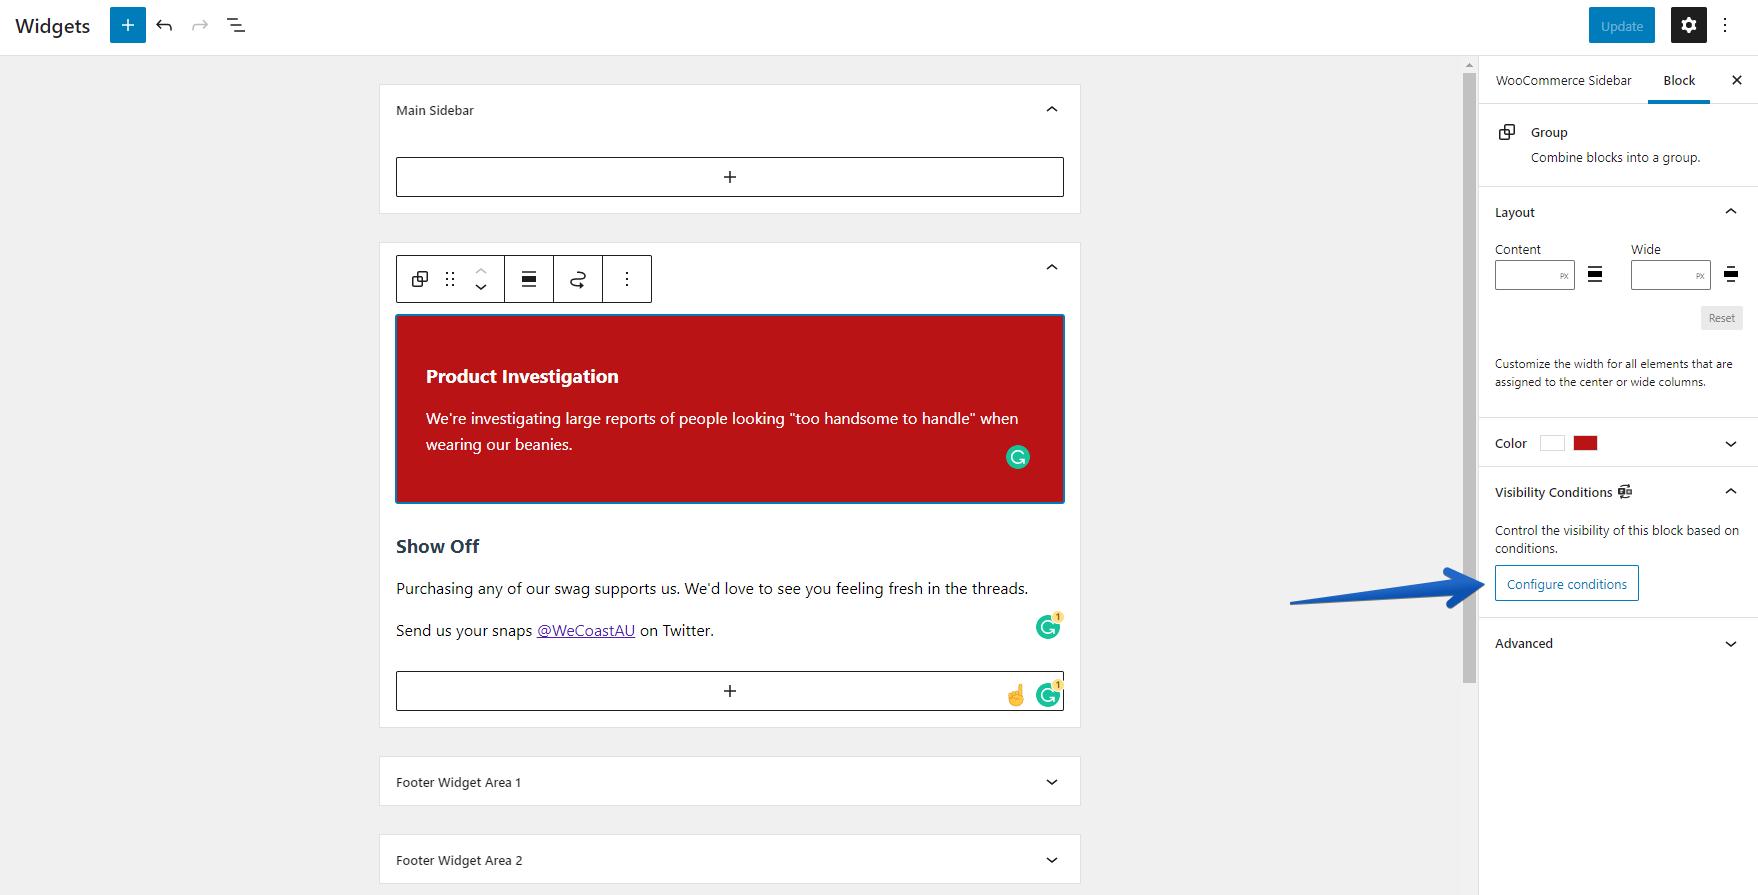 Screenshot of creating a block widget for sidebars in WordPress 5.8+